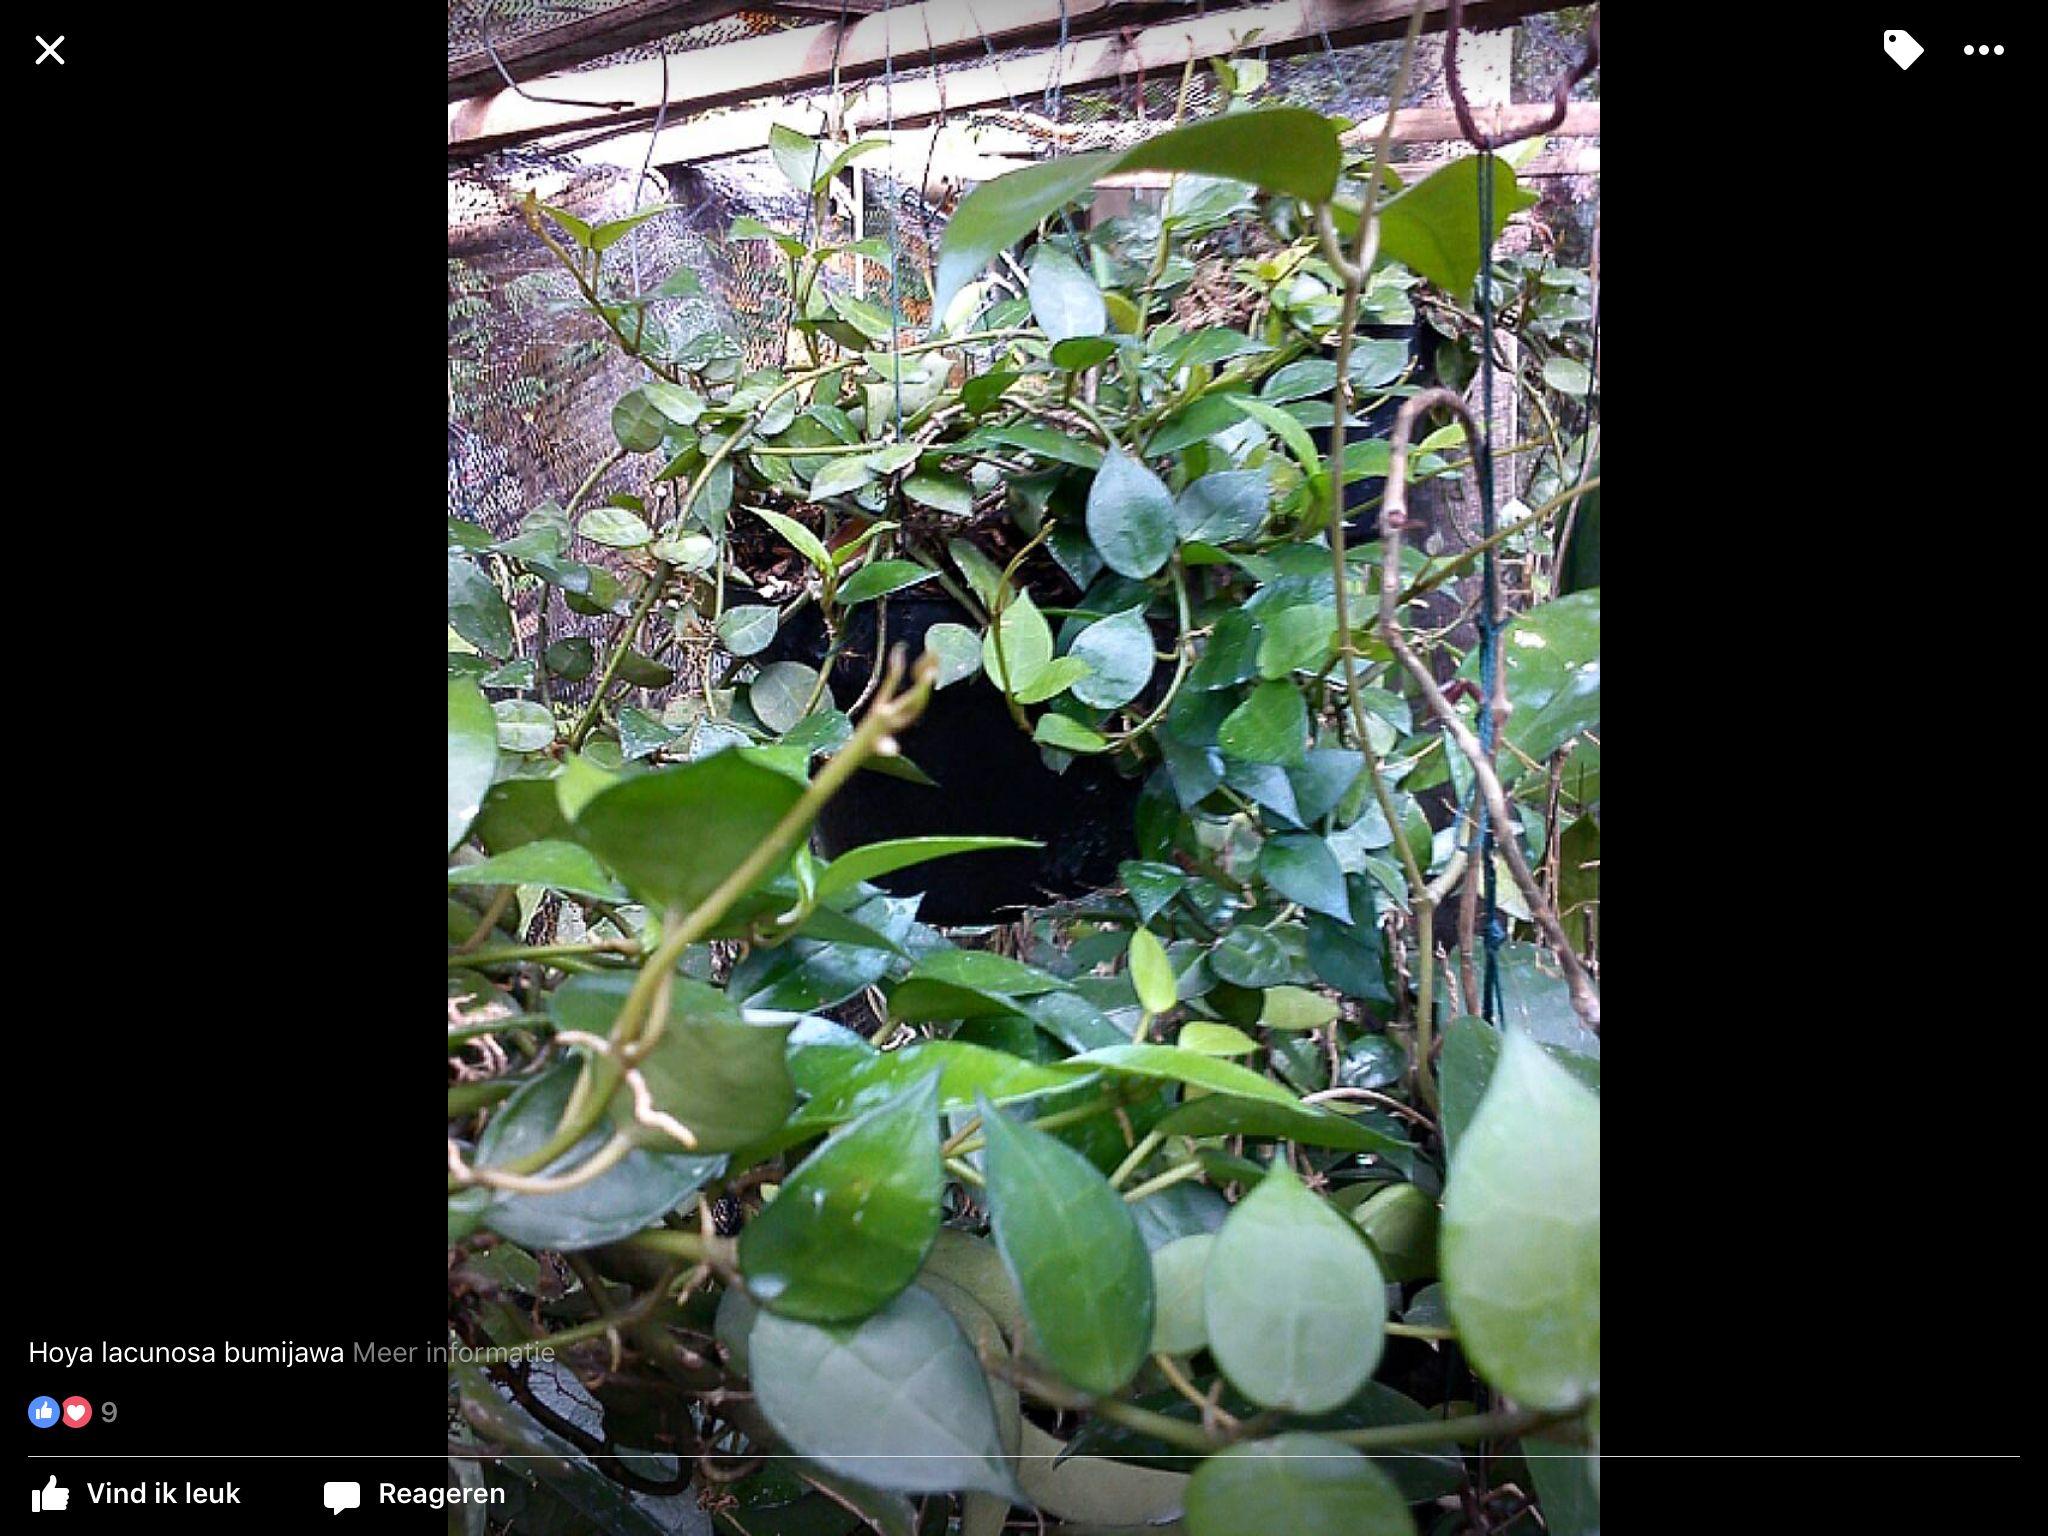 Hoya Lacunosa bamijawa